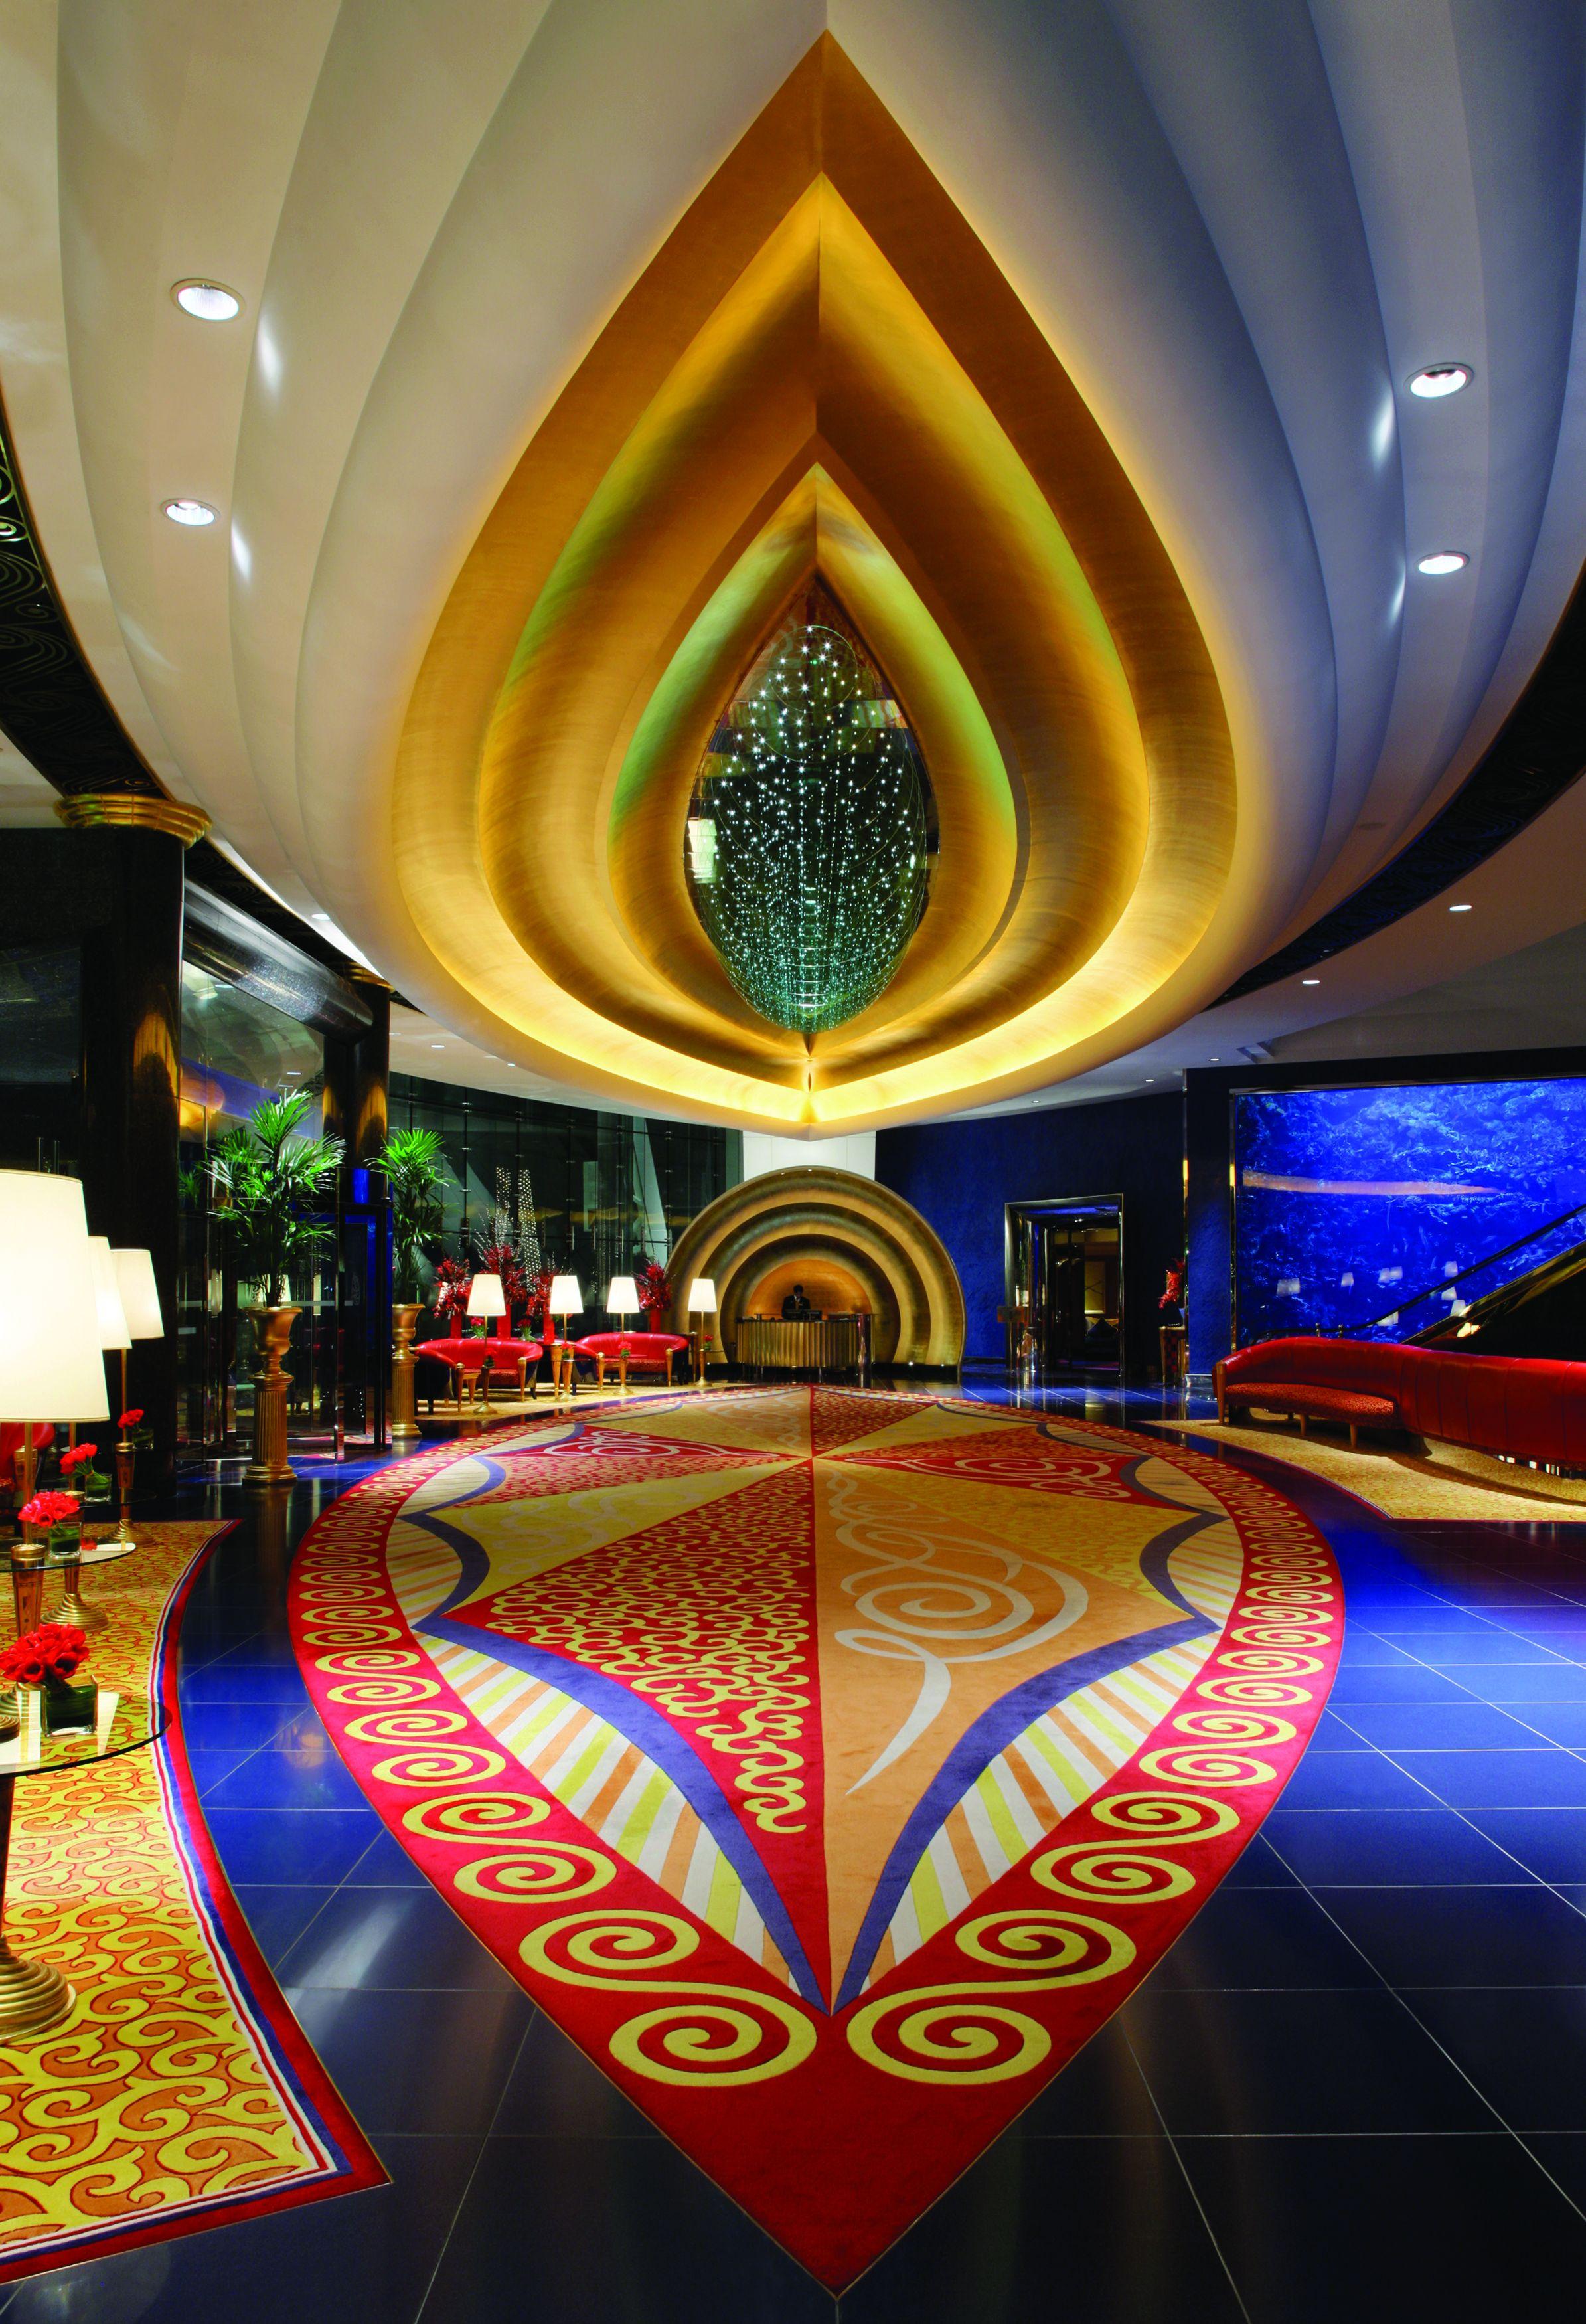 Untere Lobby im weltberühmten Burj Al Arab  Dubai – ein Jumeirah Hotel